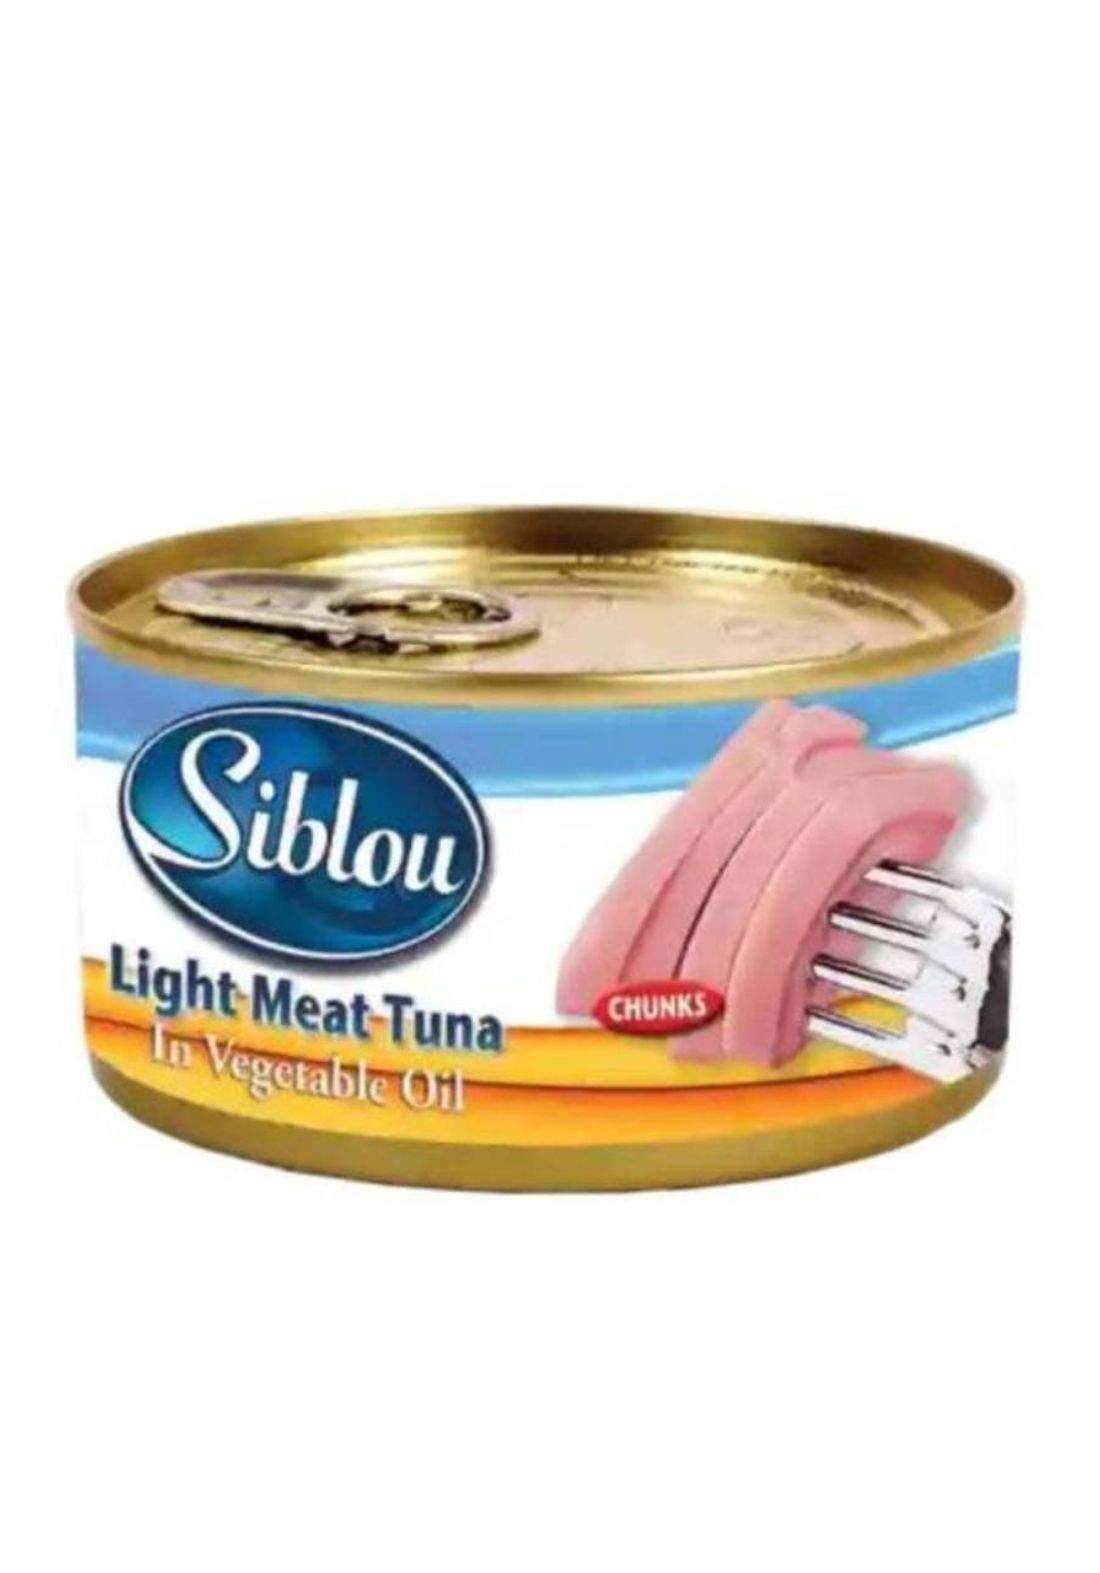 Siblou light meat tuna 120g سيبو تونا زهري